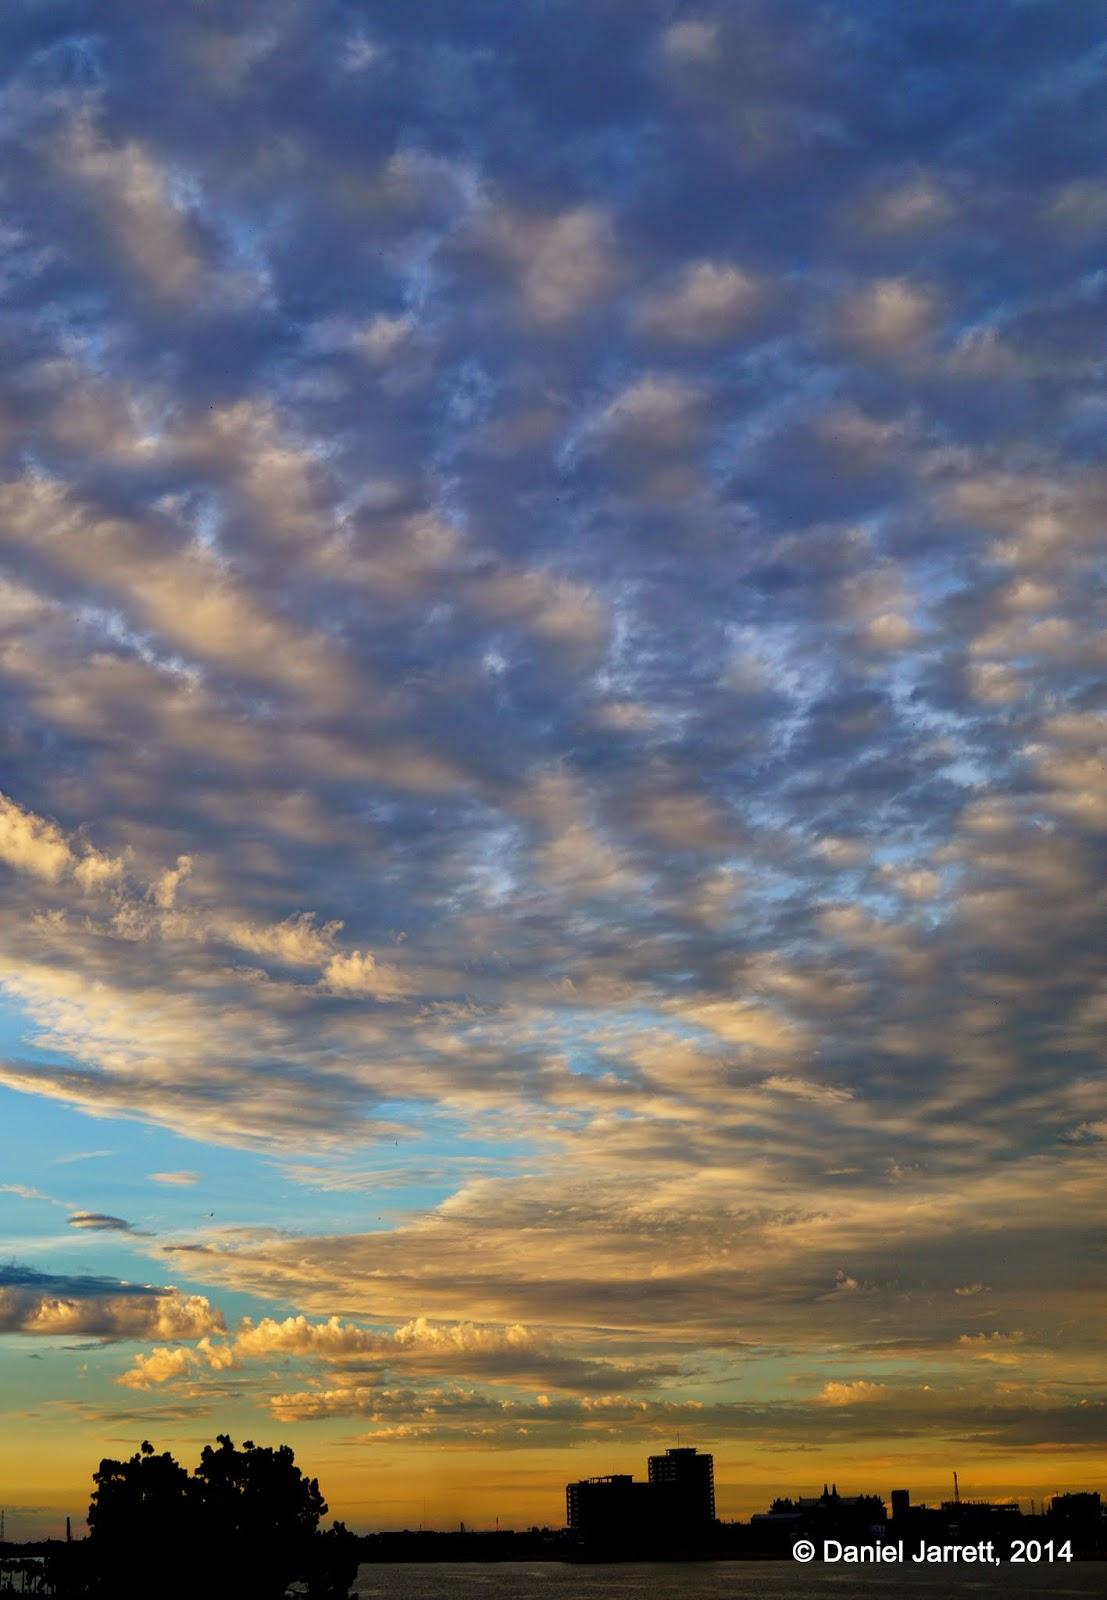 Sunset sky, Phnom Penh, Cambodia